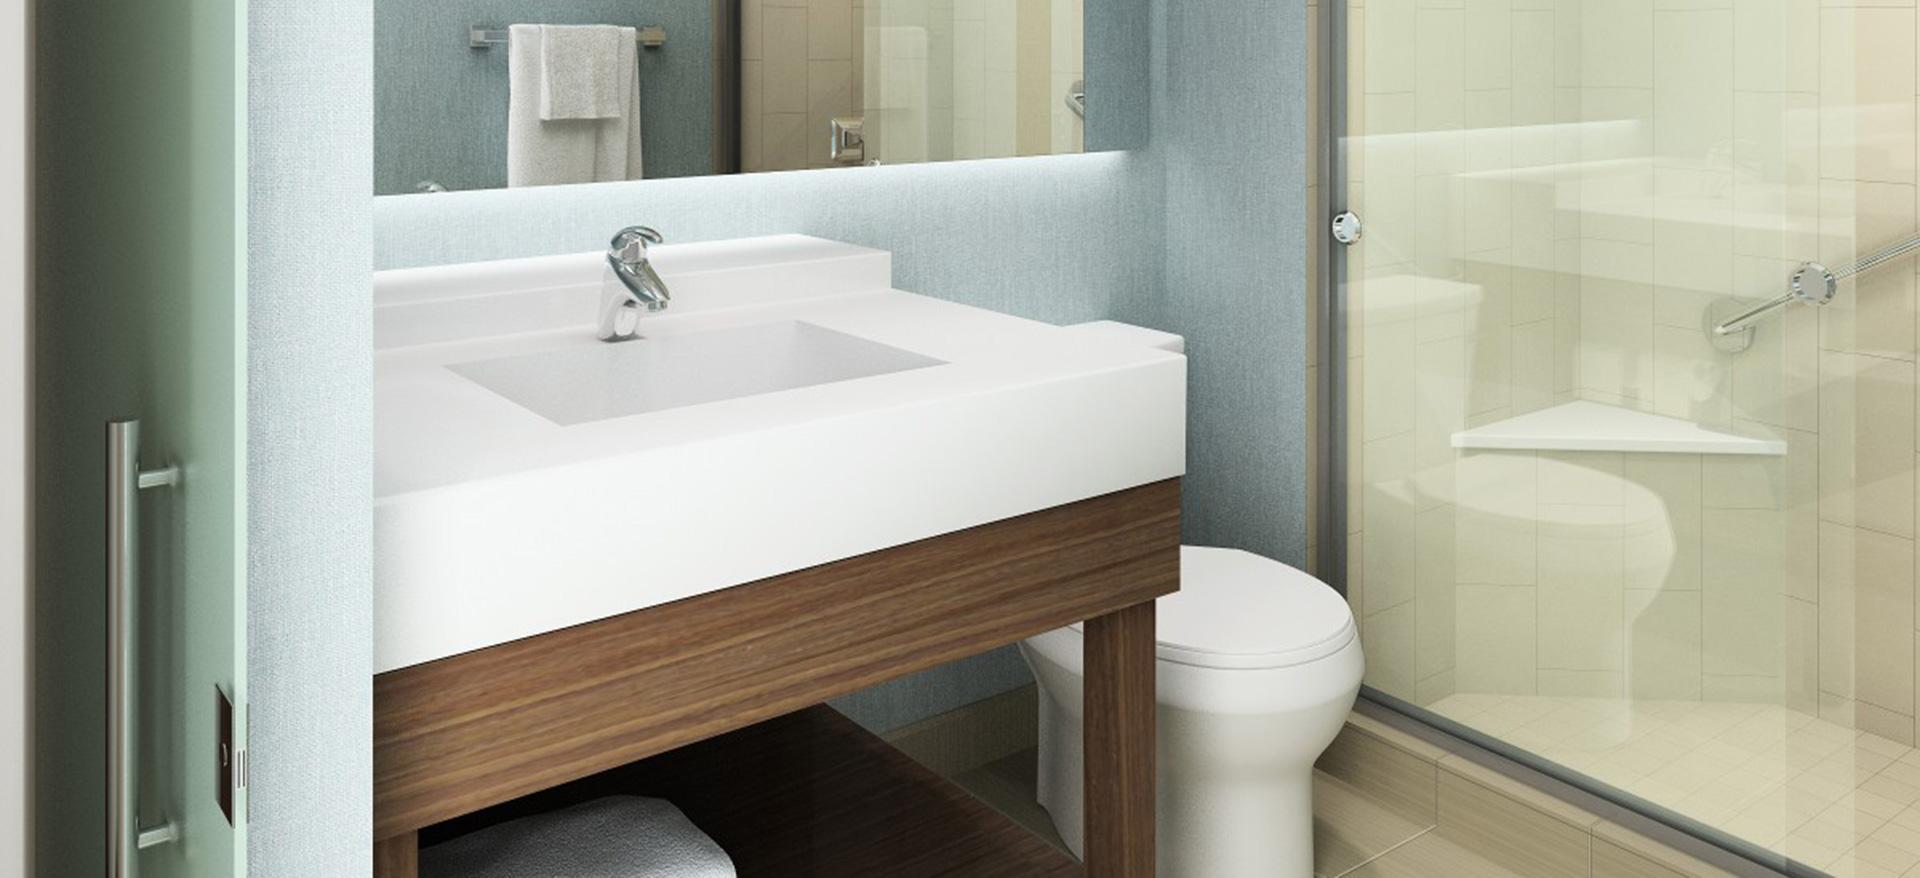 Contemporary bathroom in Hyatt Place Georgetown guestroom